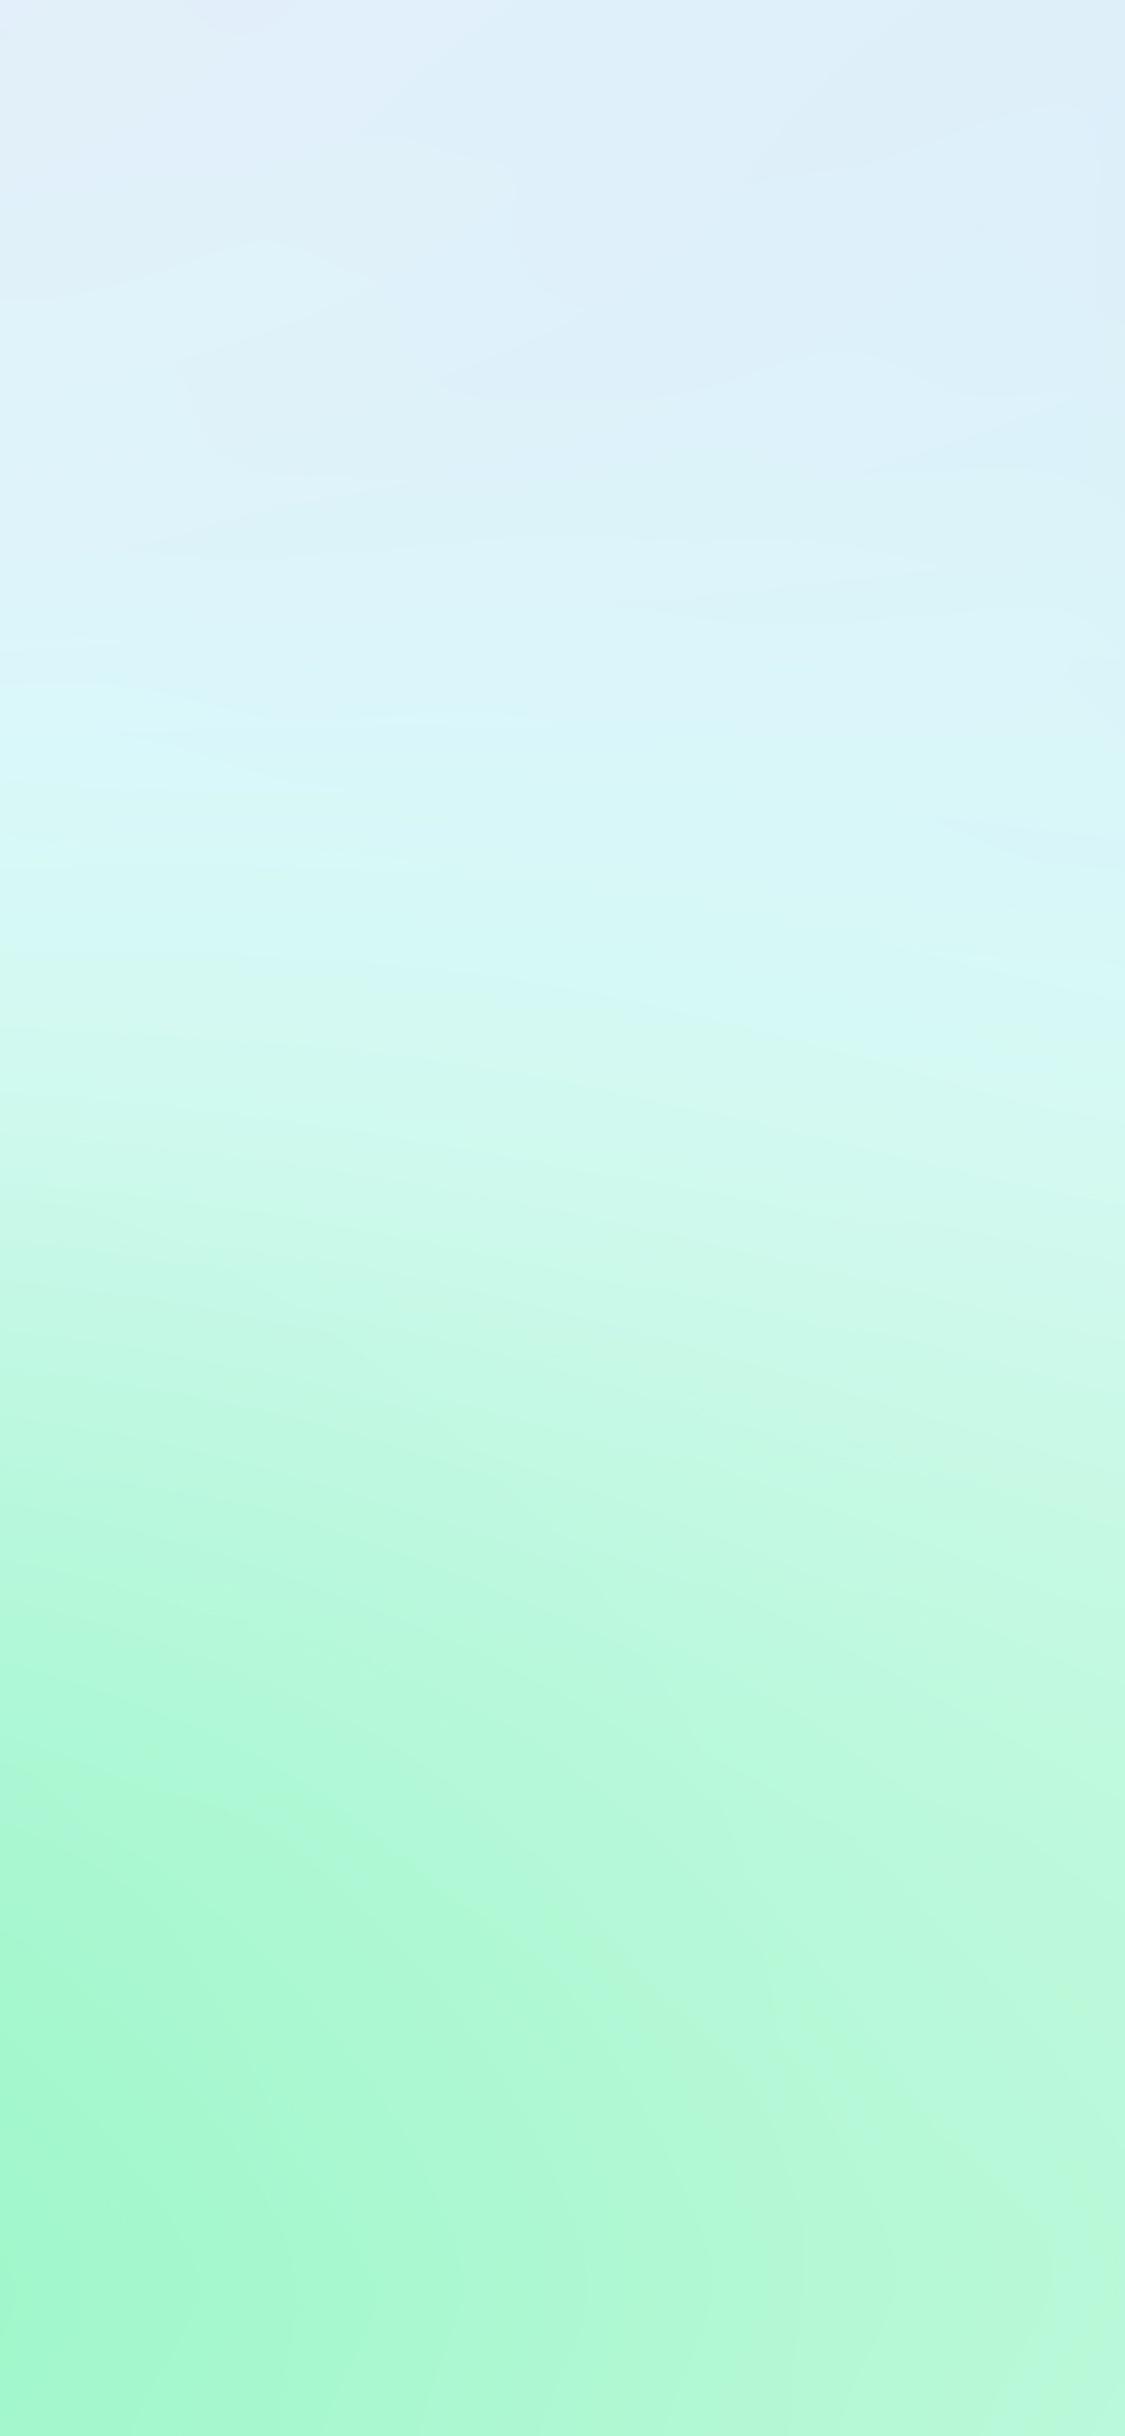 iPhoneXpapers.com-Apple-iPhone-wallpaper-sk14-cute-green-blur-gradation